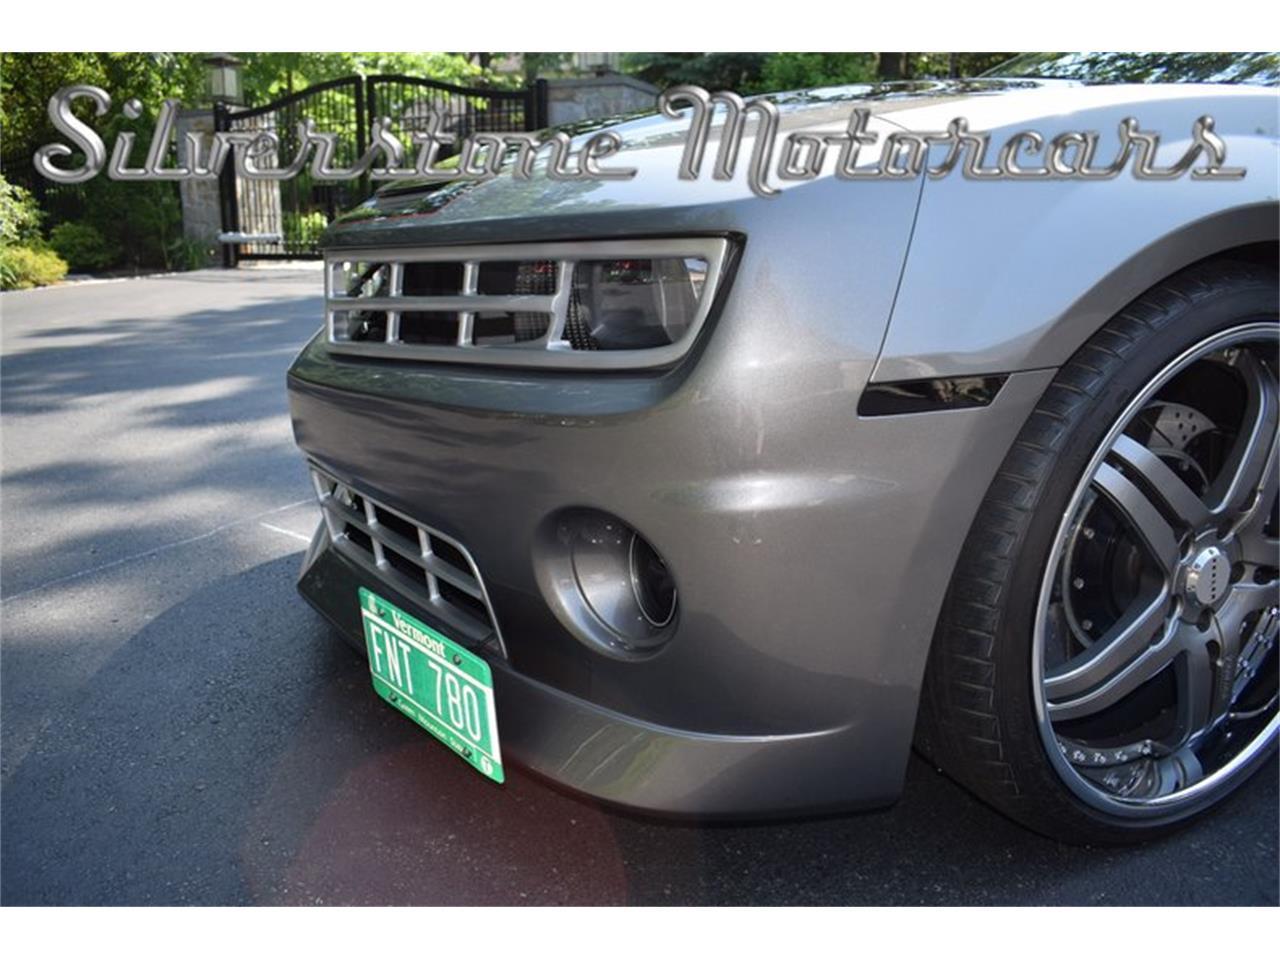 2010 Chevrolet Camaro (CC-1015813) for sale in North Andover, Massachusetts